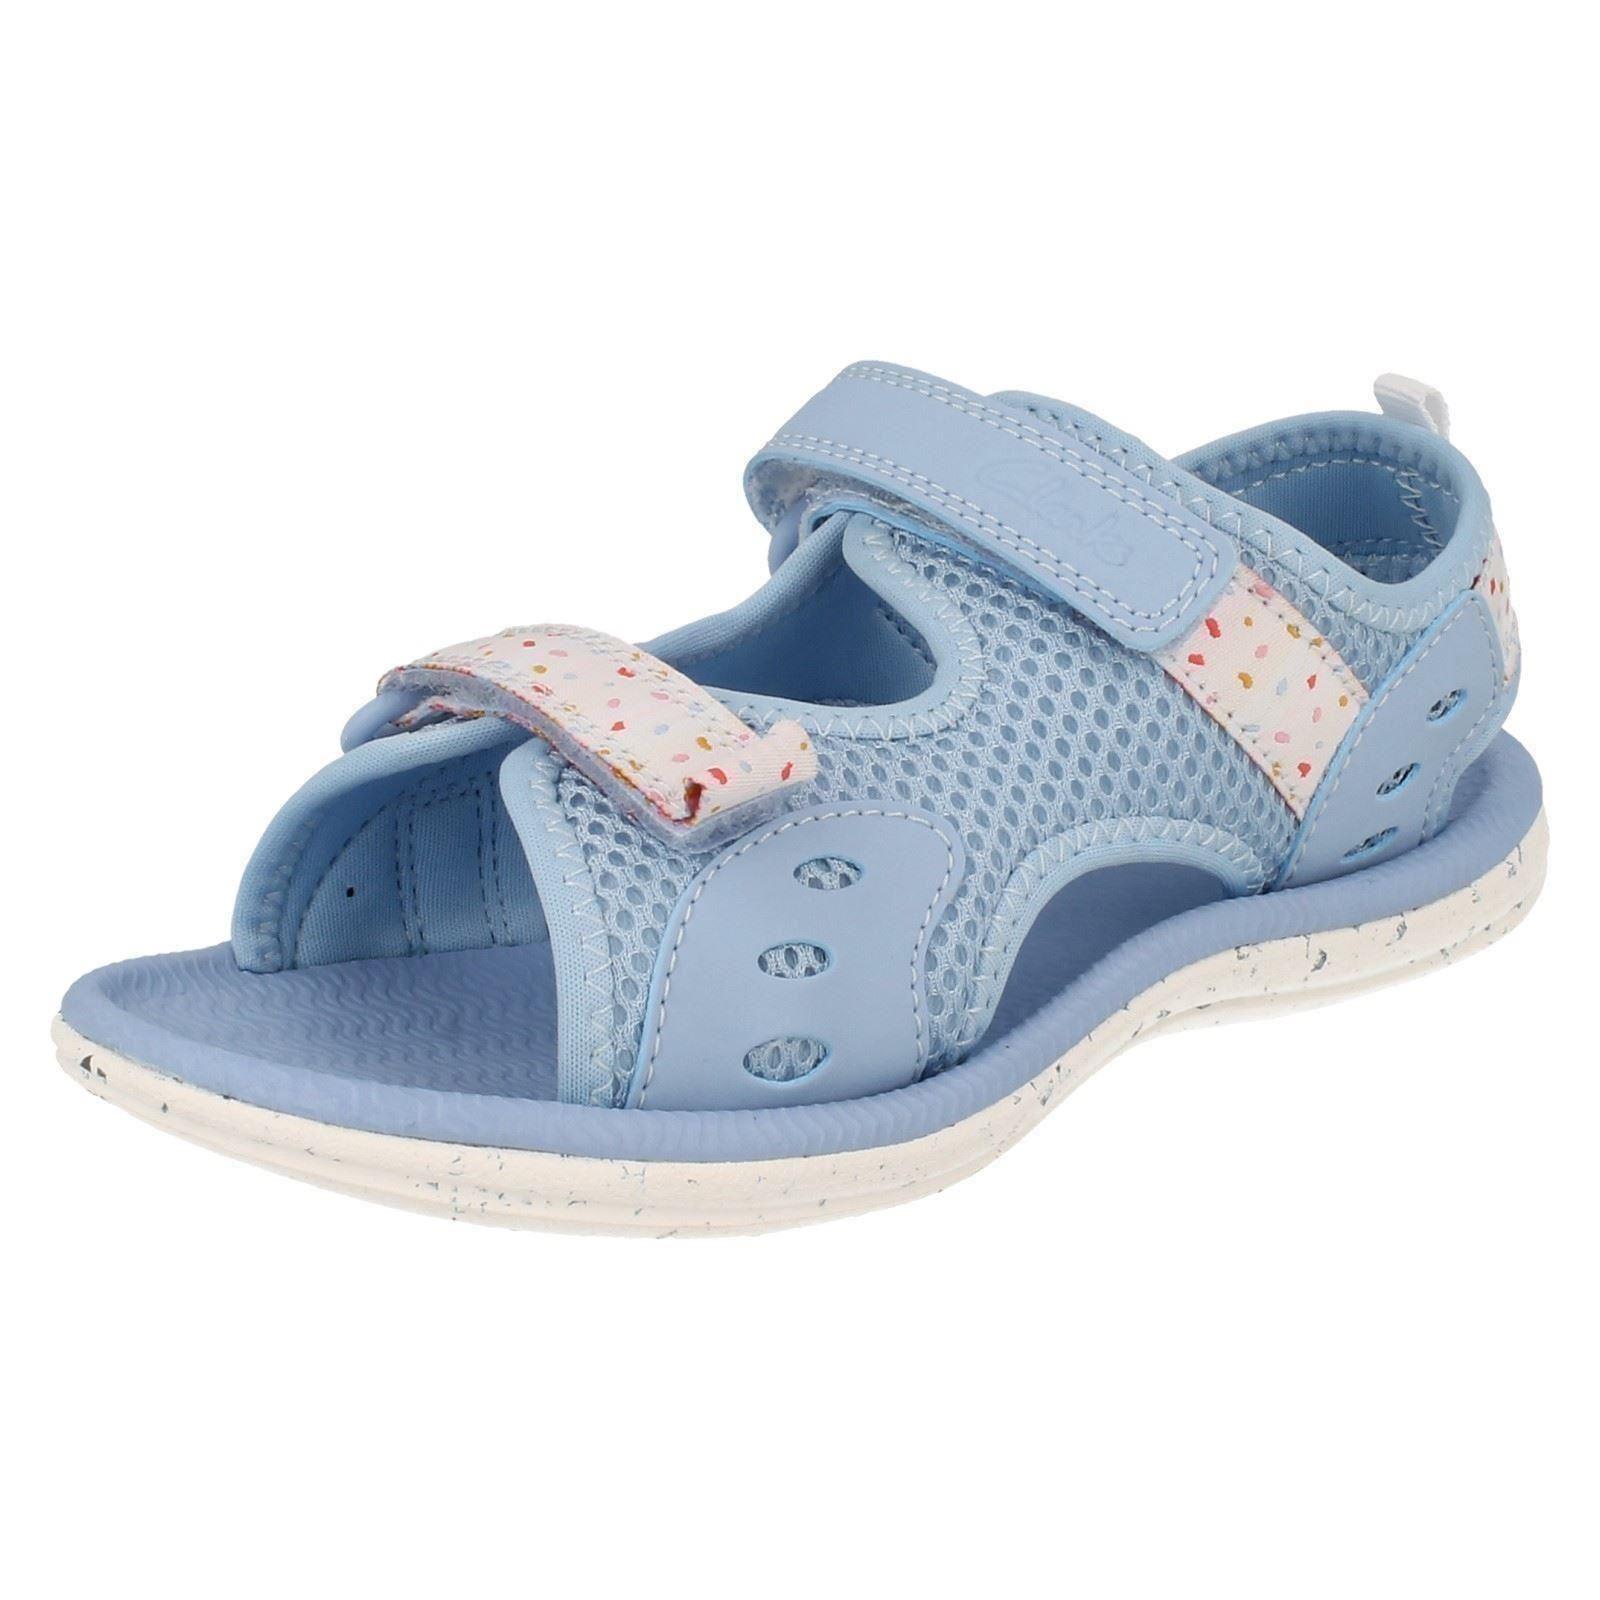 a4be3a96da39 039-Clarks-Girls-039-Sandals-Star-Games thumbnail 12